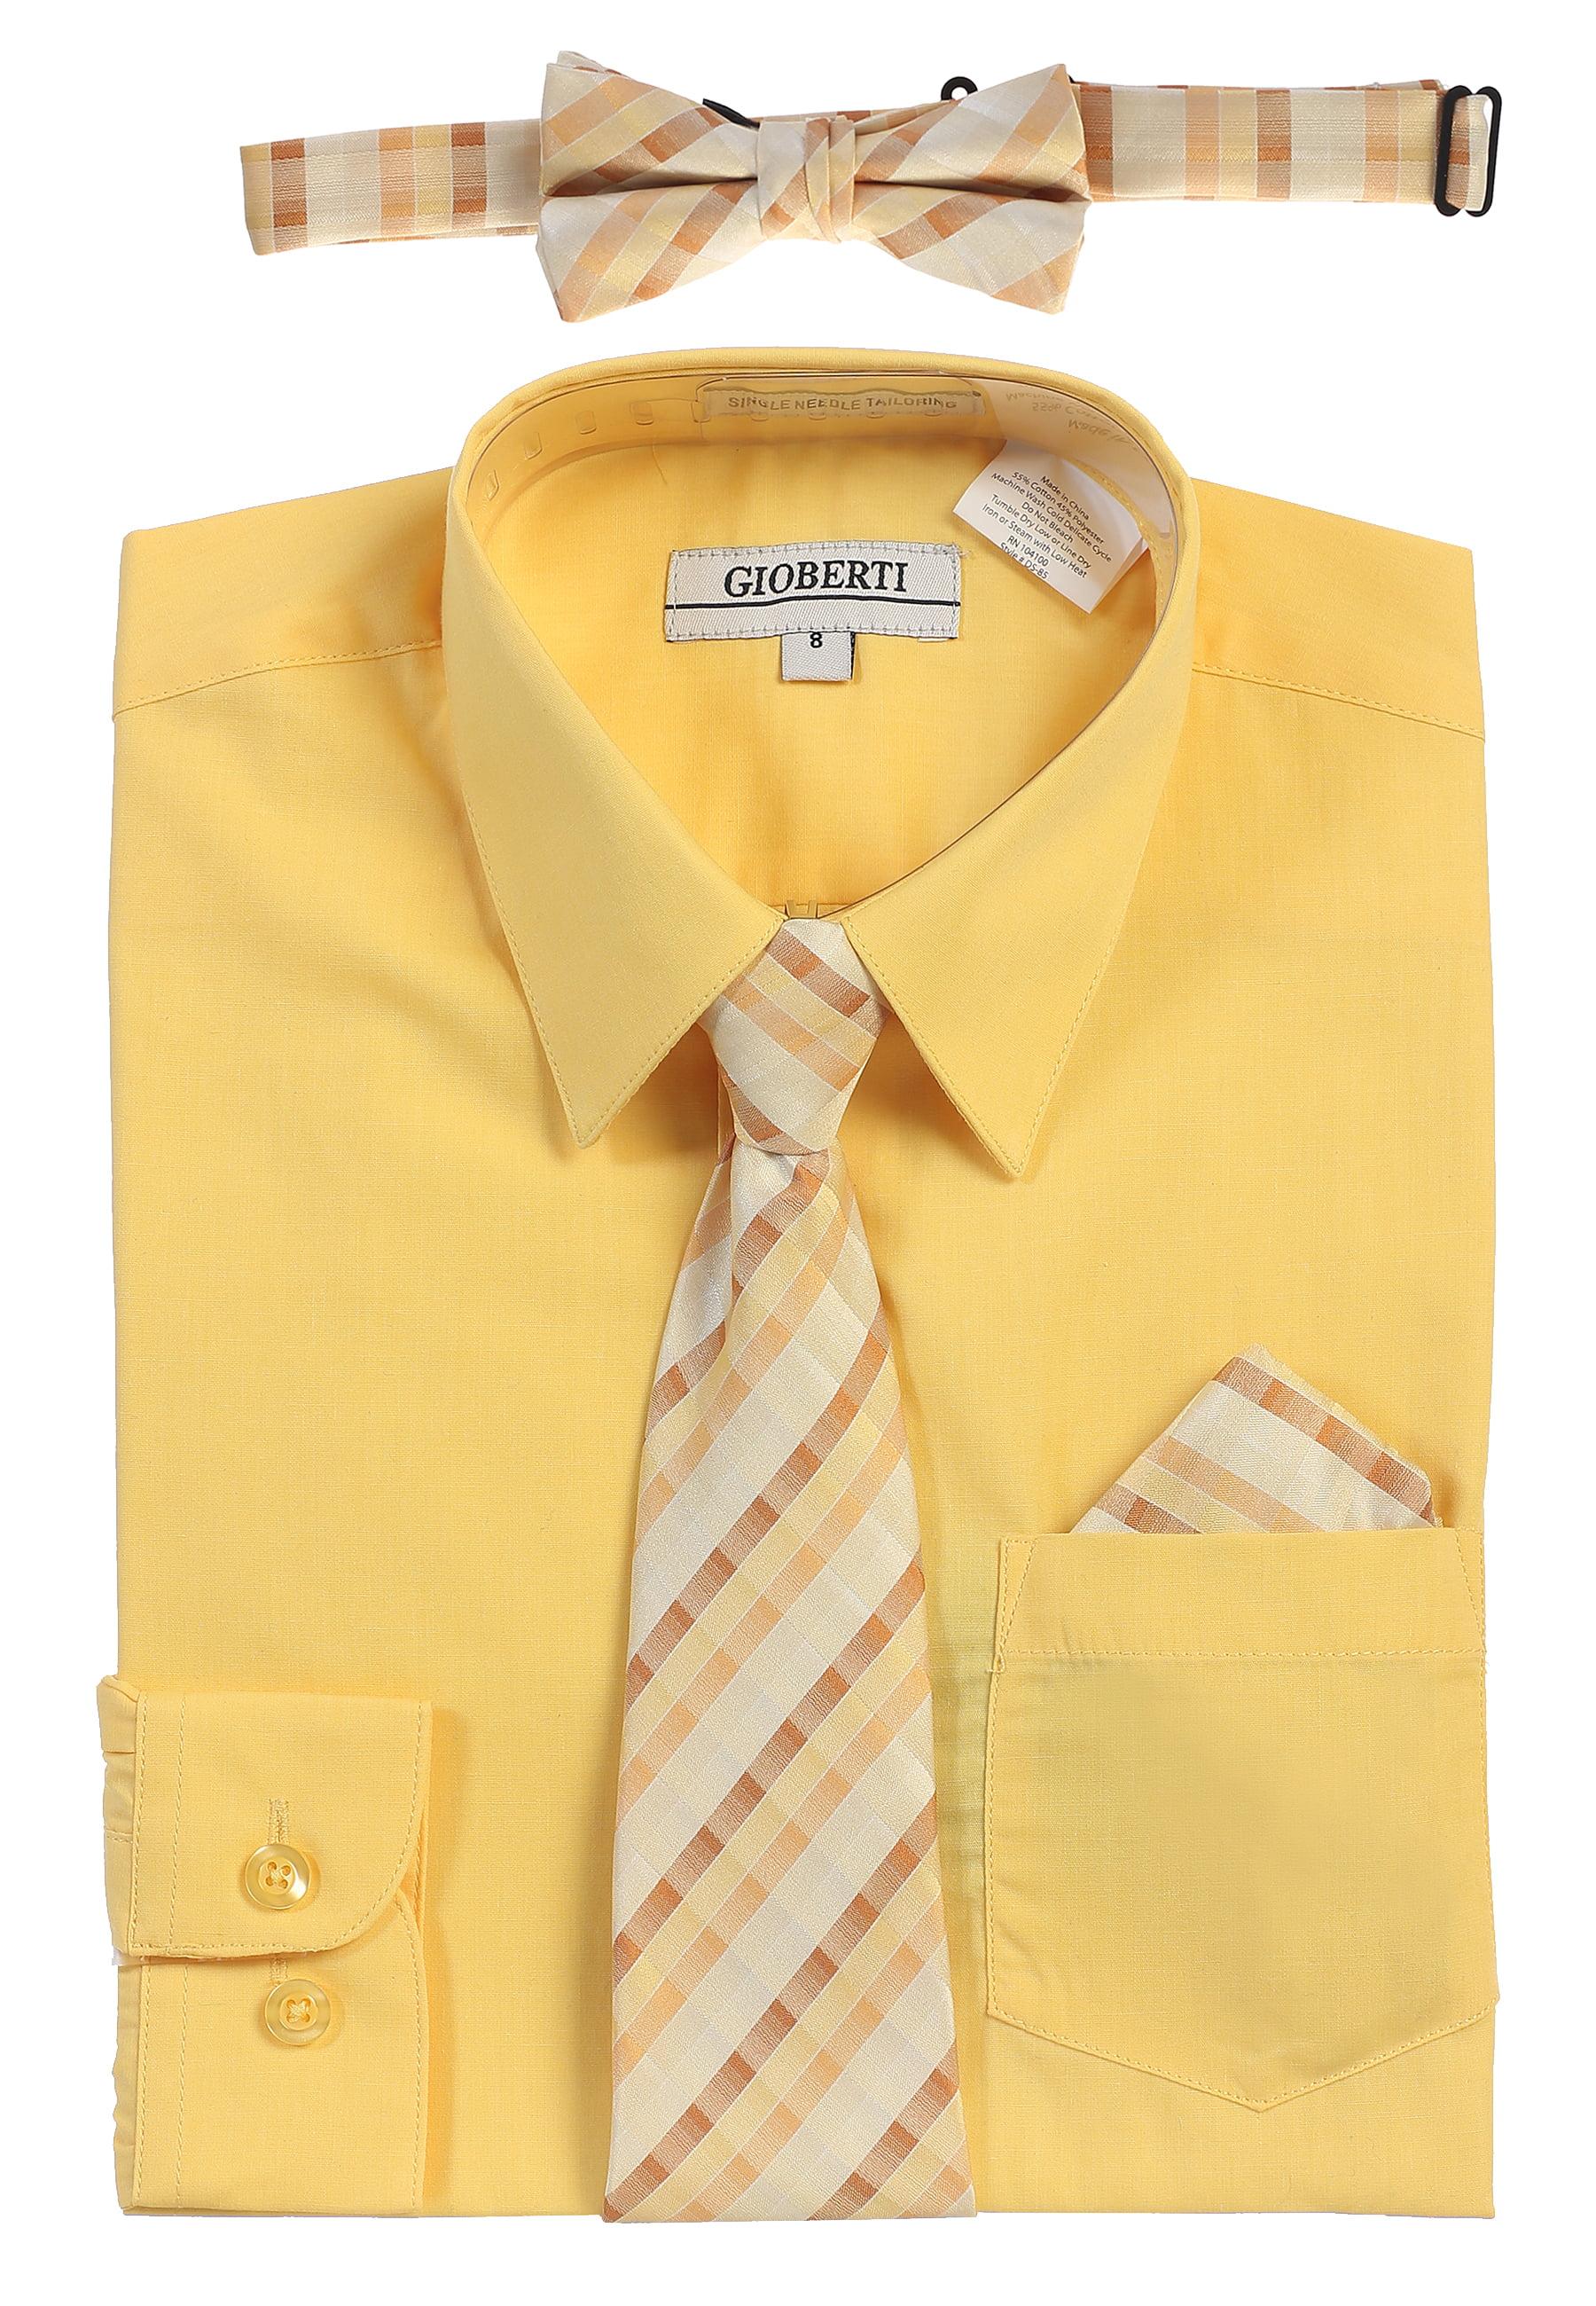 Gioberti Boy's Long Sleeve Dress Shirt and Tie Set